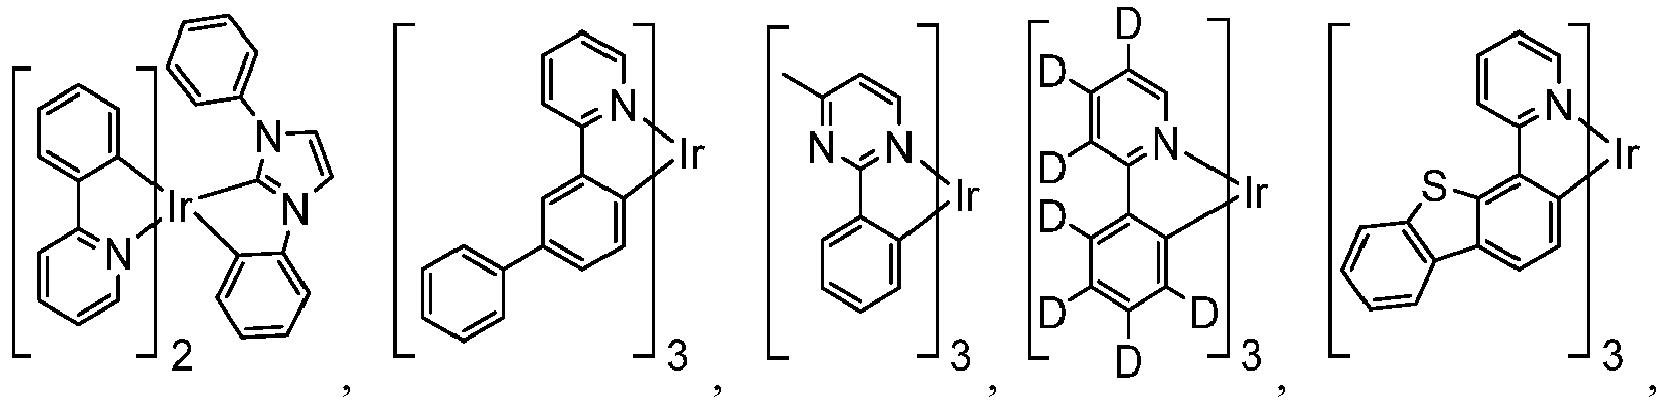 Figure imgb0252